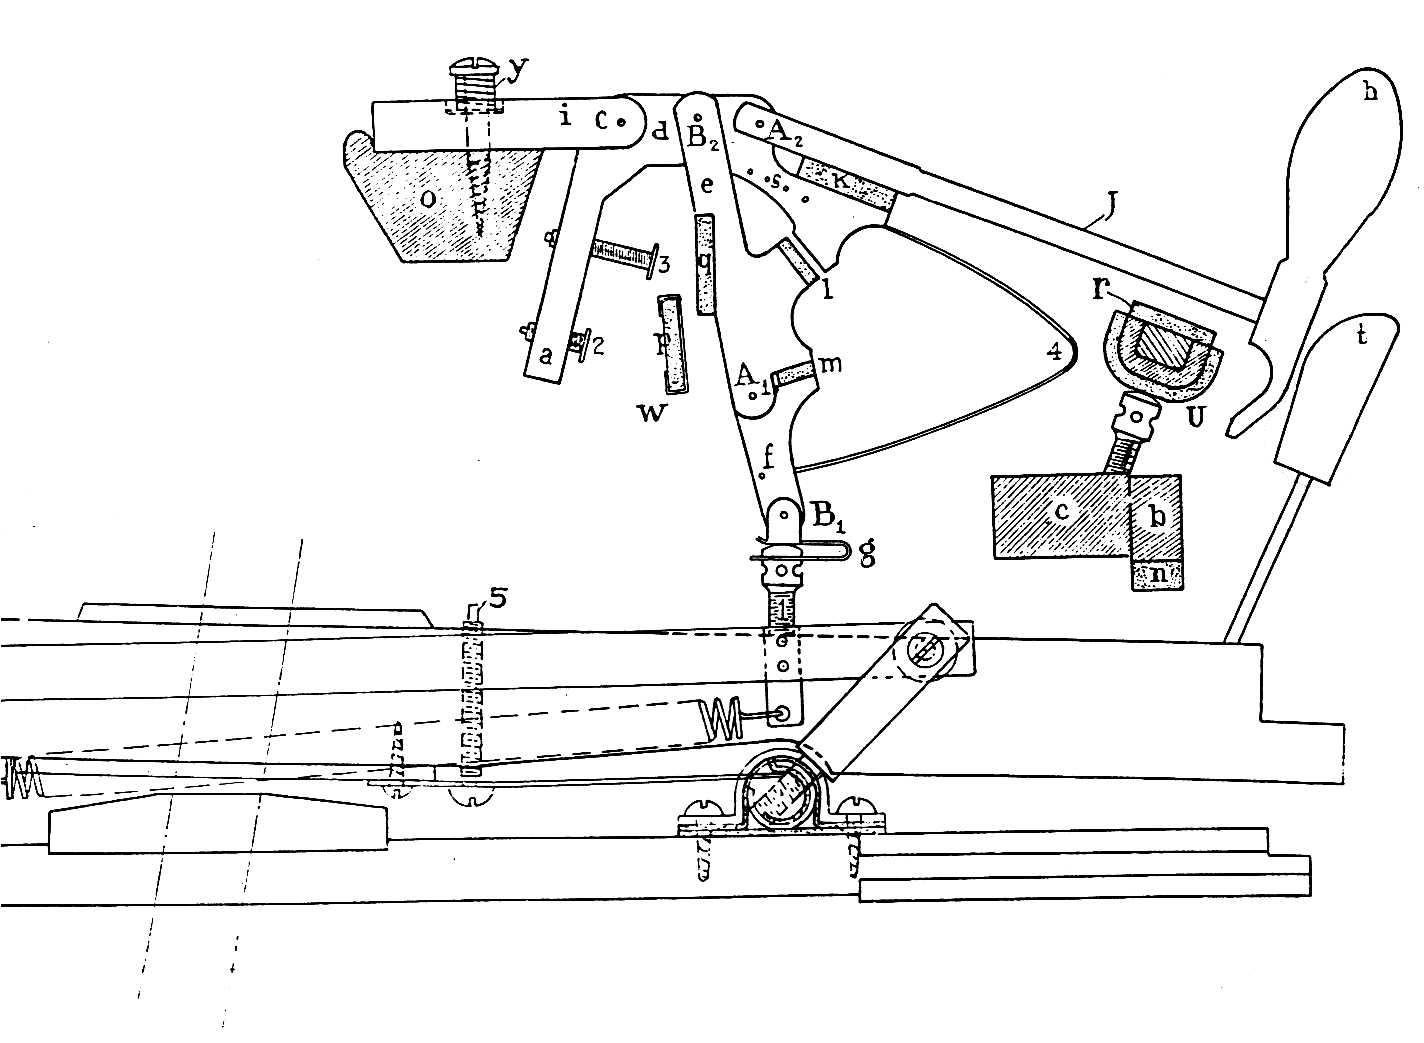 tags: #mill part diagram#cnc mill coordinates#tree cnc mill wiring diagram#cnc  router diagram#6 axis cnc mill#bridgeport m head diagram#cnc router wiring